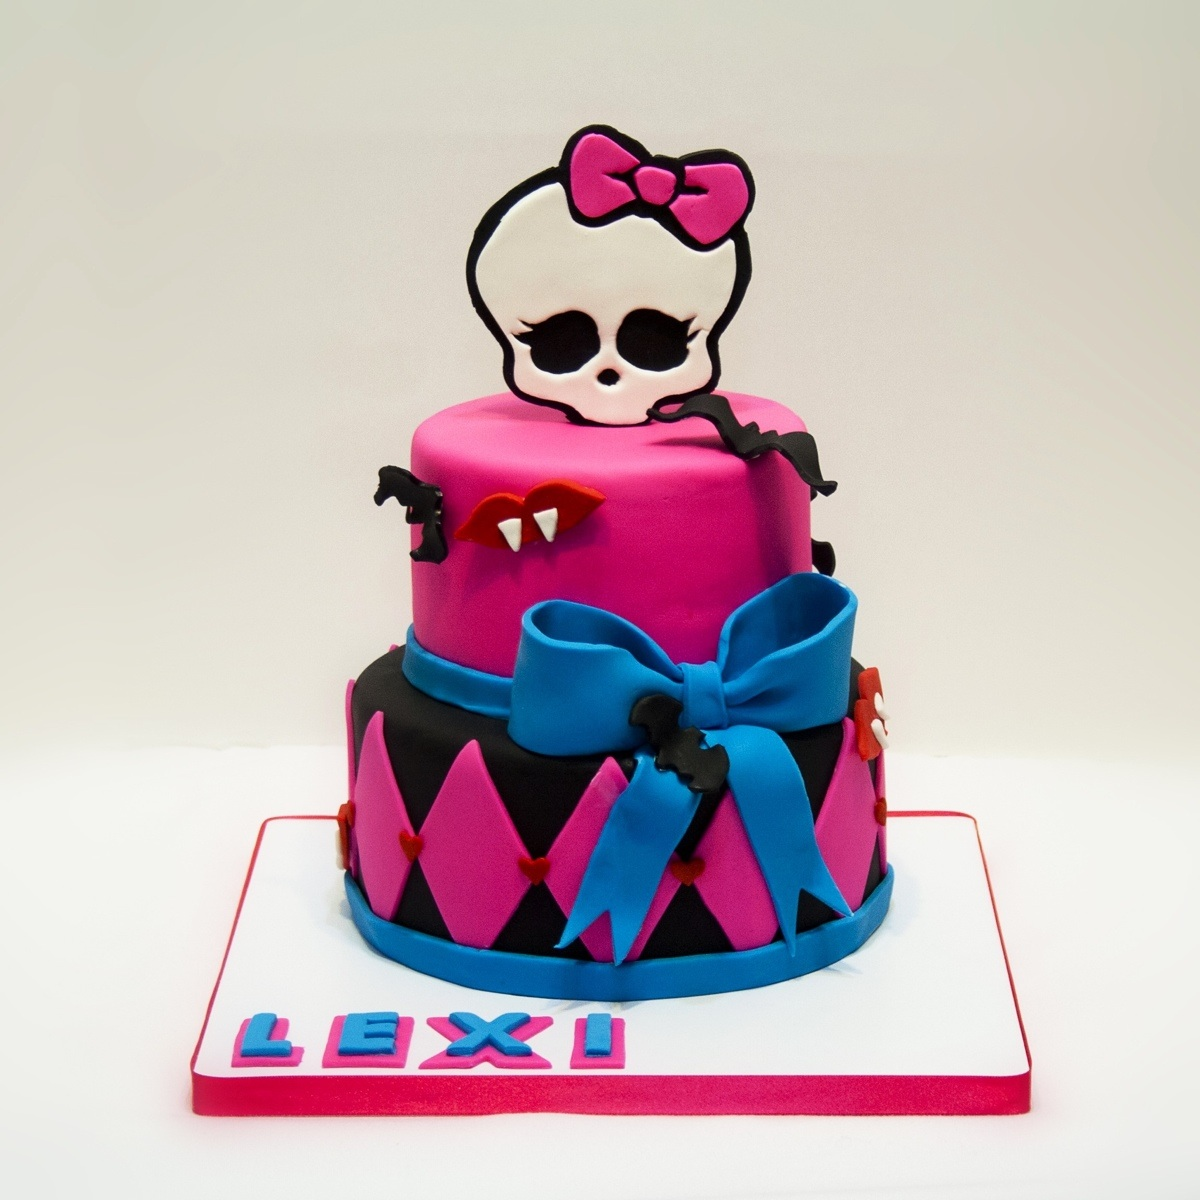 high cakes decoration ideas birthday cakes